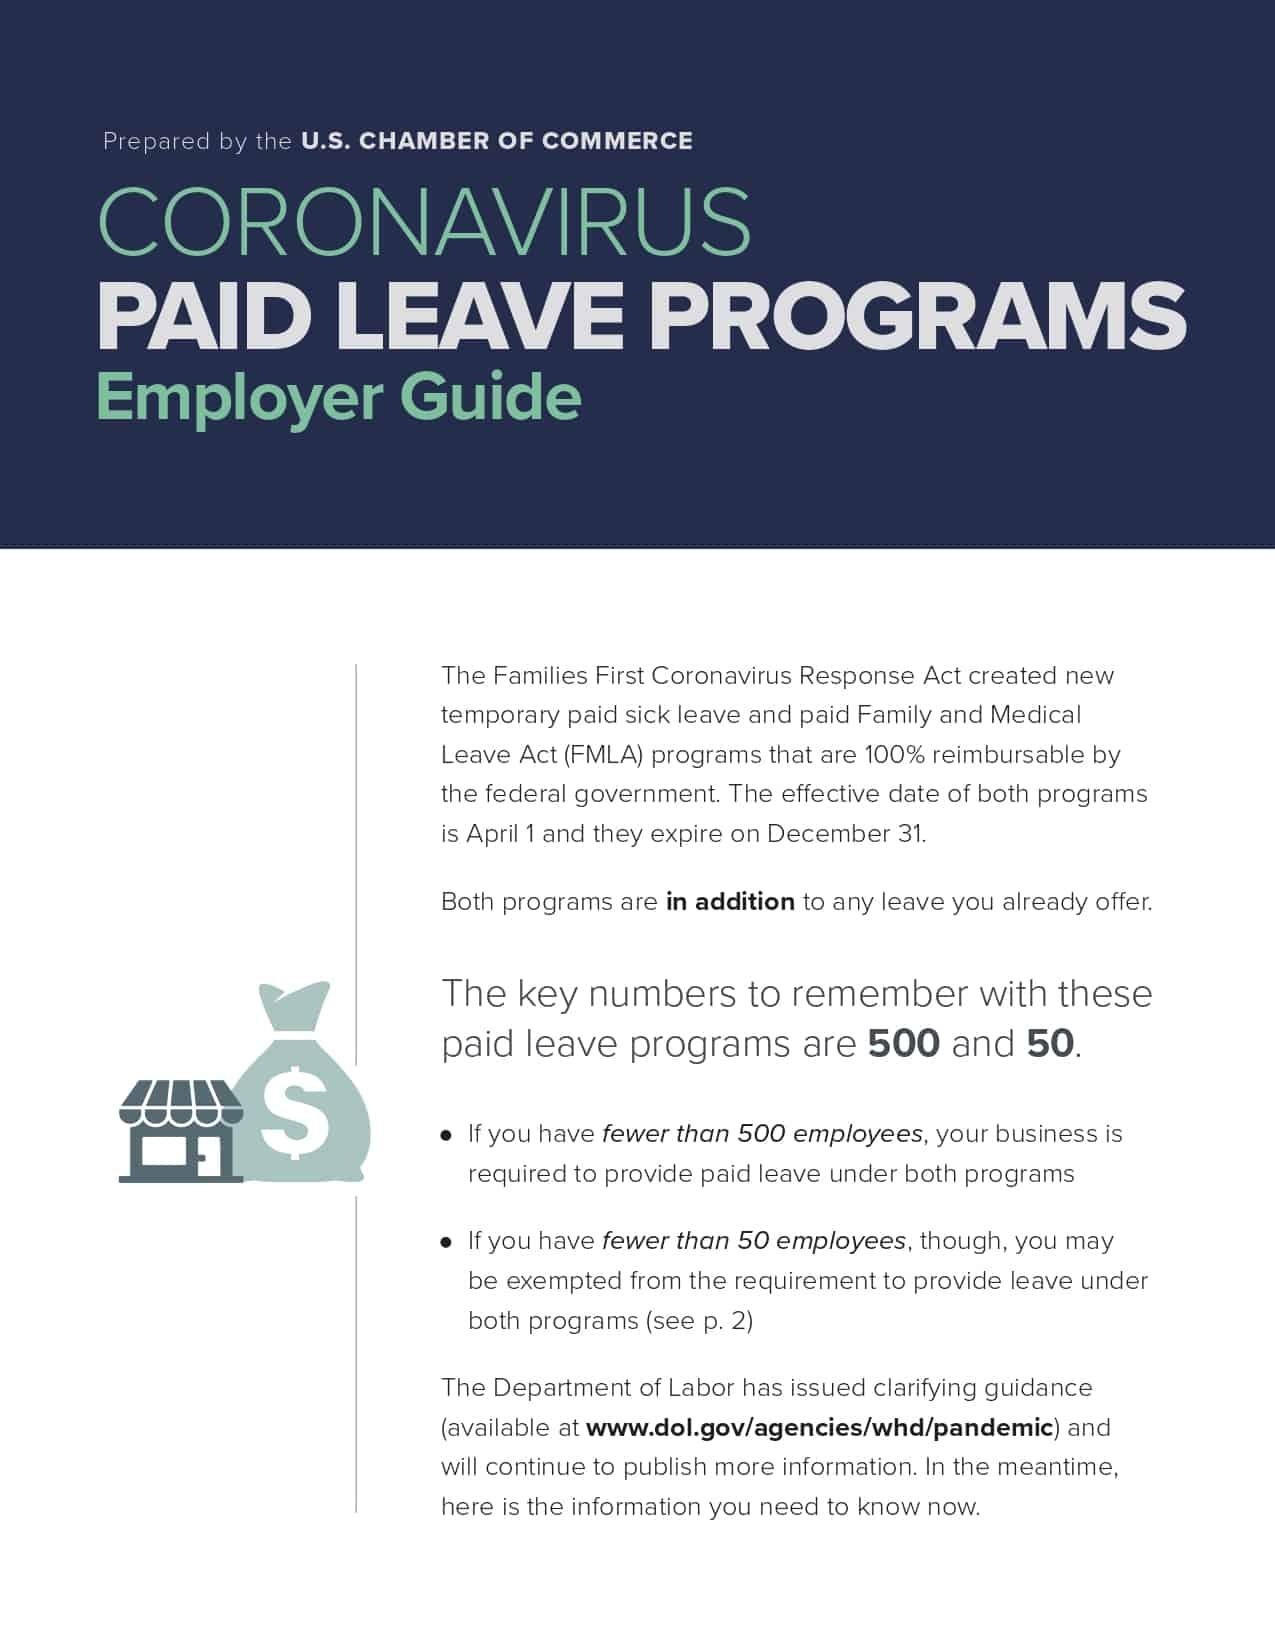 uscc_coronavirus_fmla_paid-leave-programs-guide_page-0001